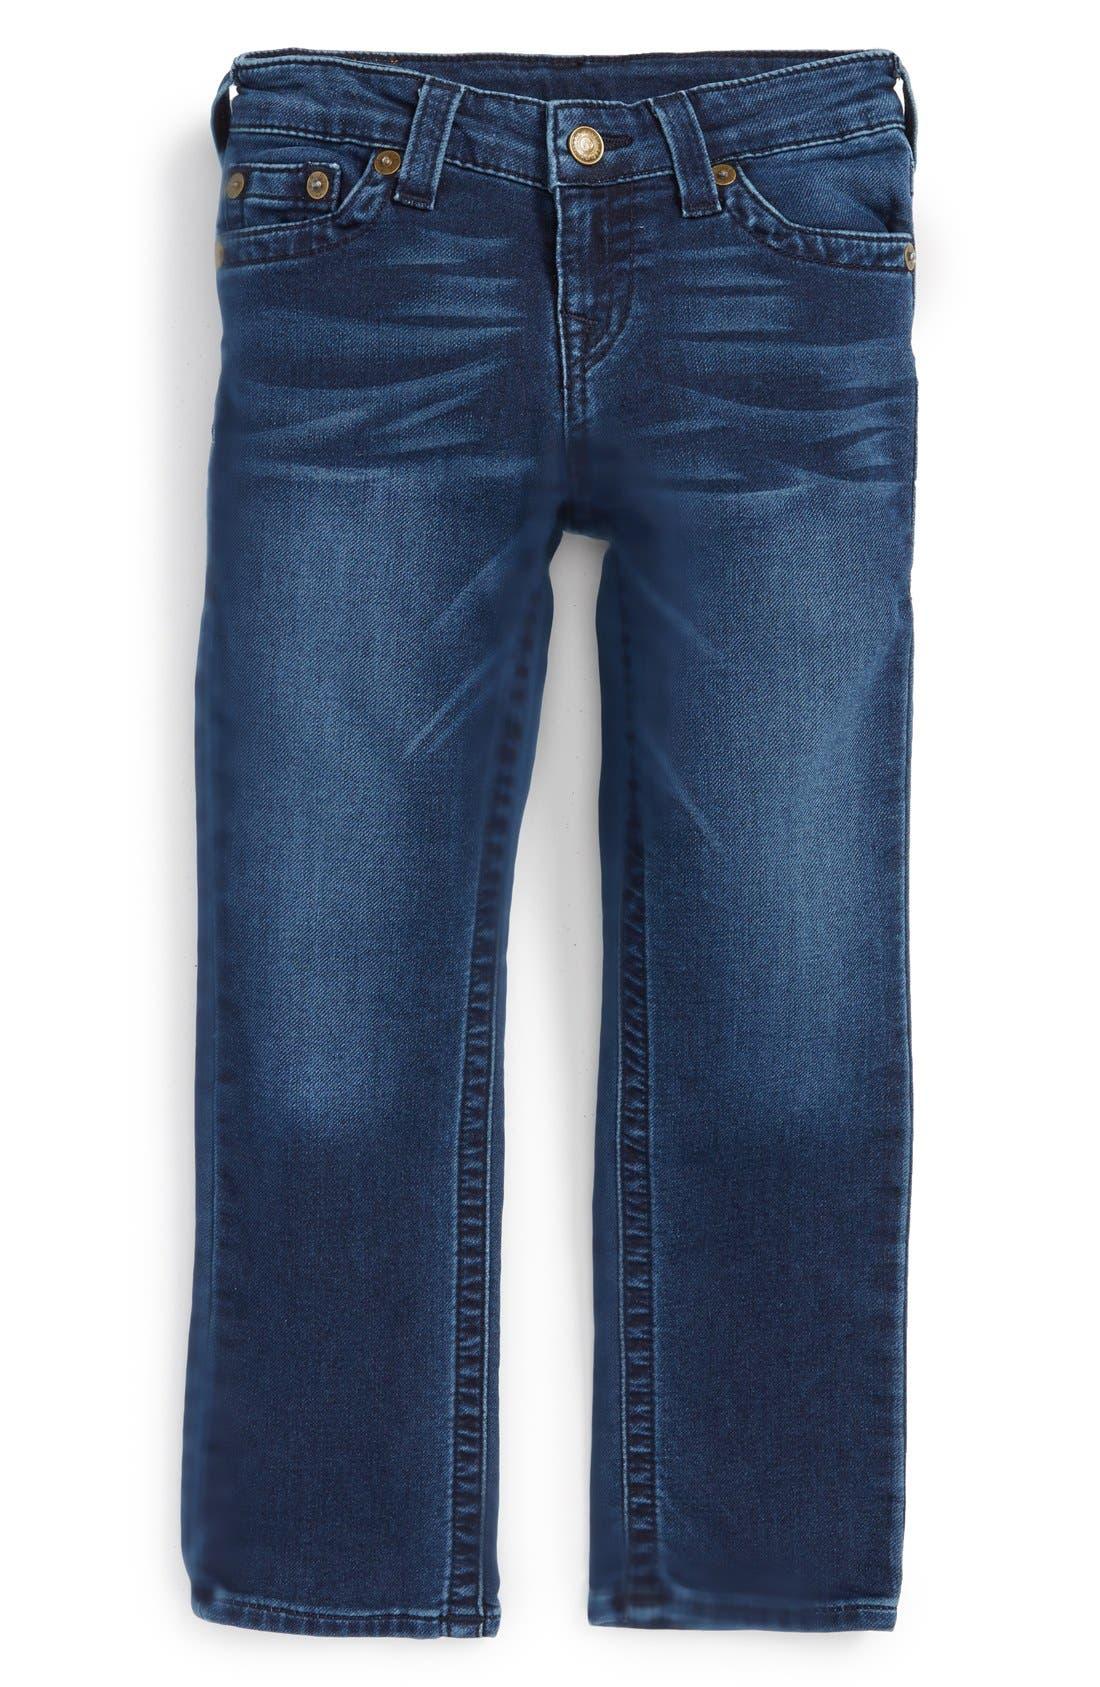 Alternate Image 1 Selected - True Religion Brand Jeans 'Knit Sweatpant' Jeans (Toddler Boys & Little Boys)